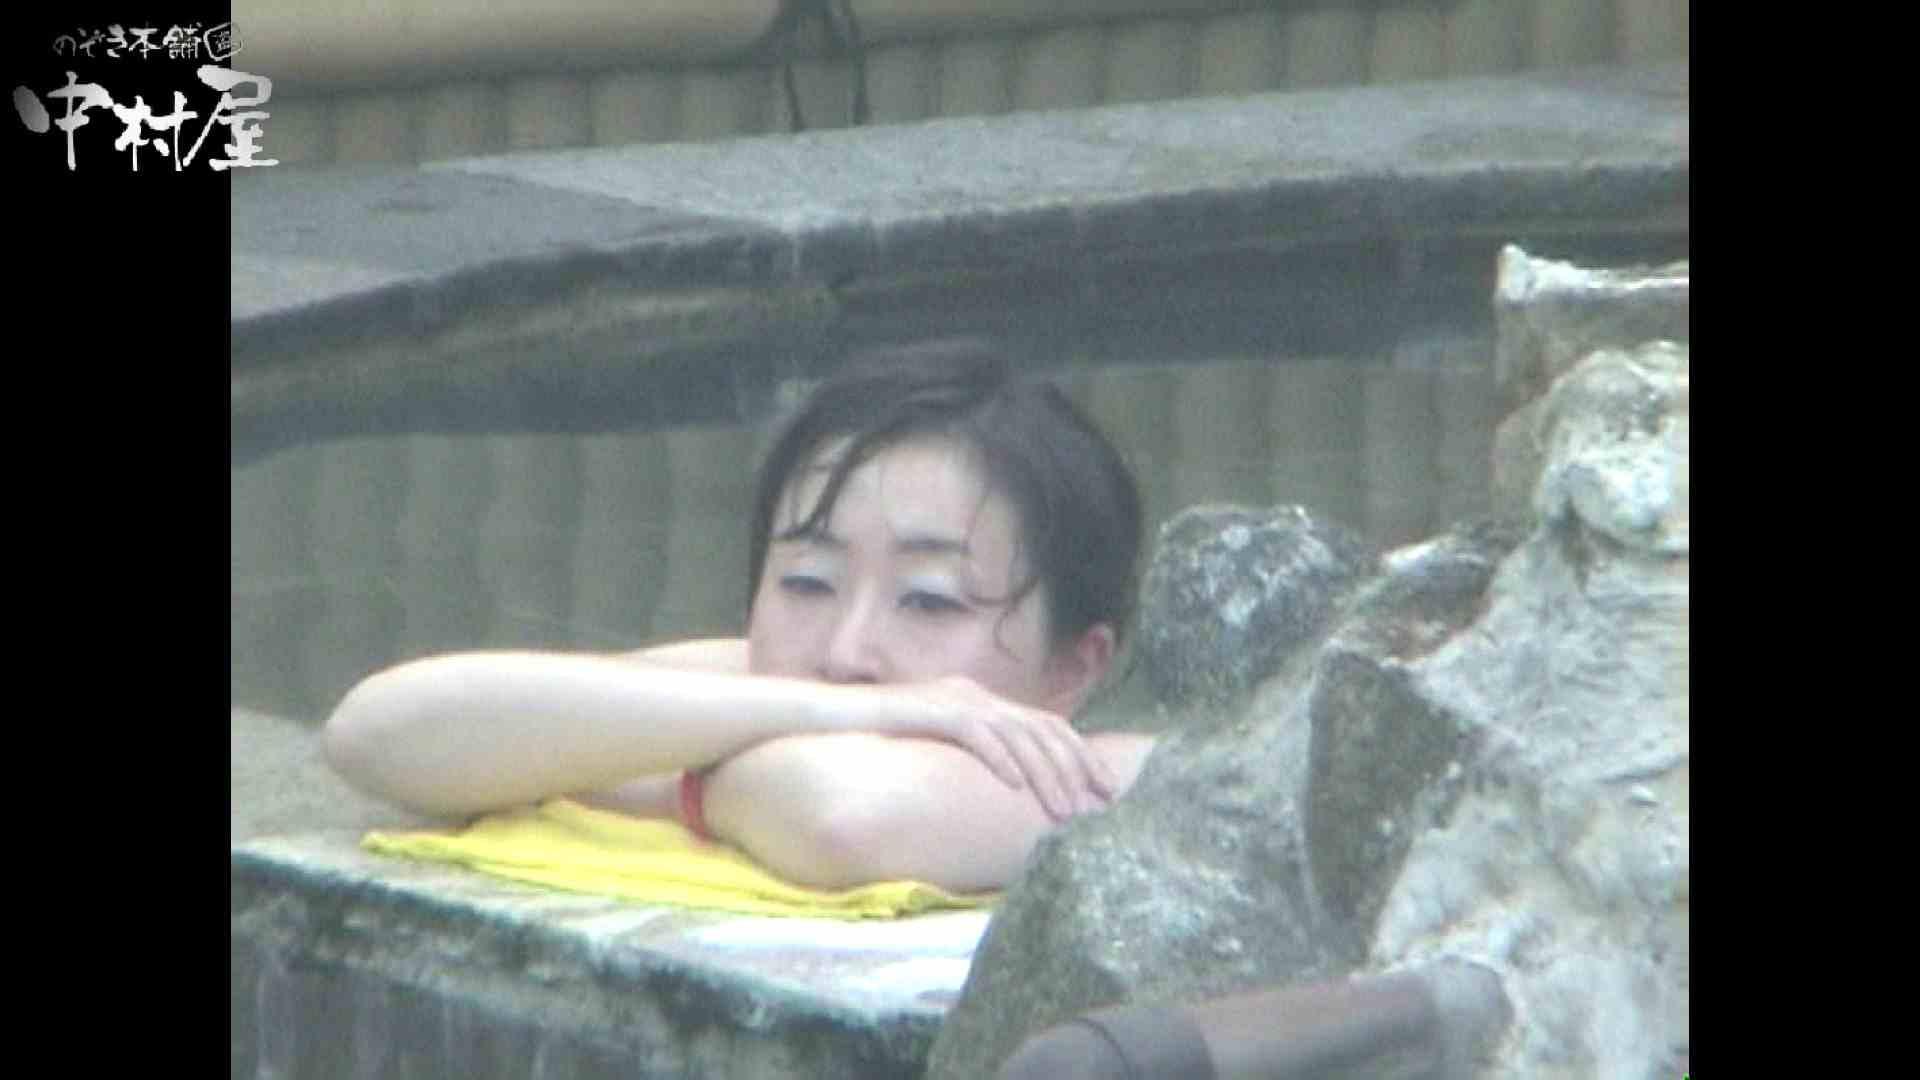 Aquaな露天風呂Vol.957 盗撮シリーズ | 露天風呂編  110PIX 85